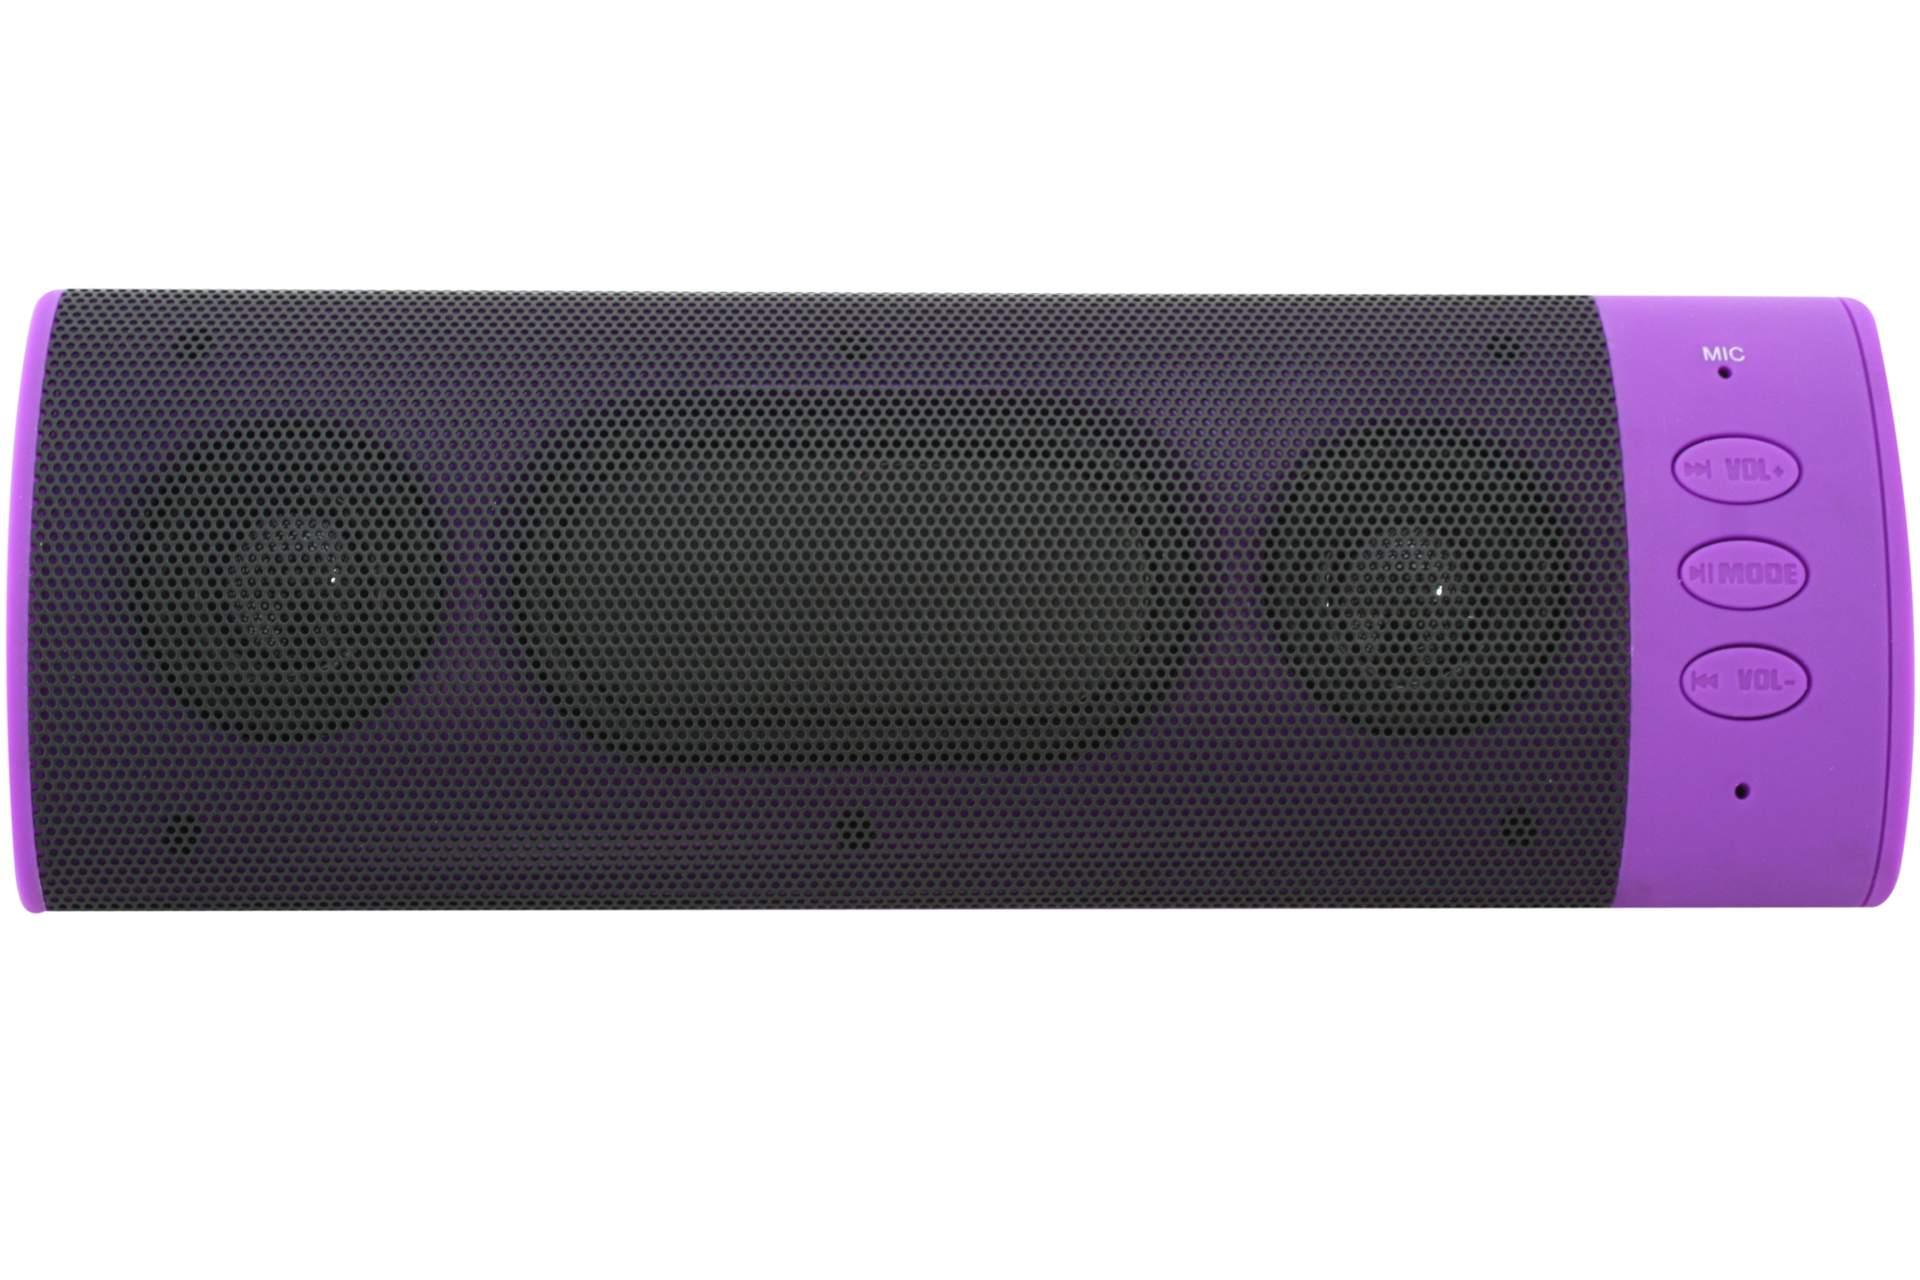 bluetooth lautsprecher handy mini anlage mikro lila schwarz. Black Bedroom Furniture Sets. Home Design Ideas